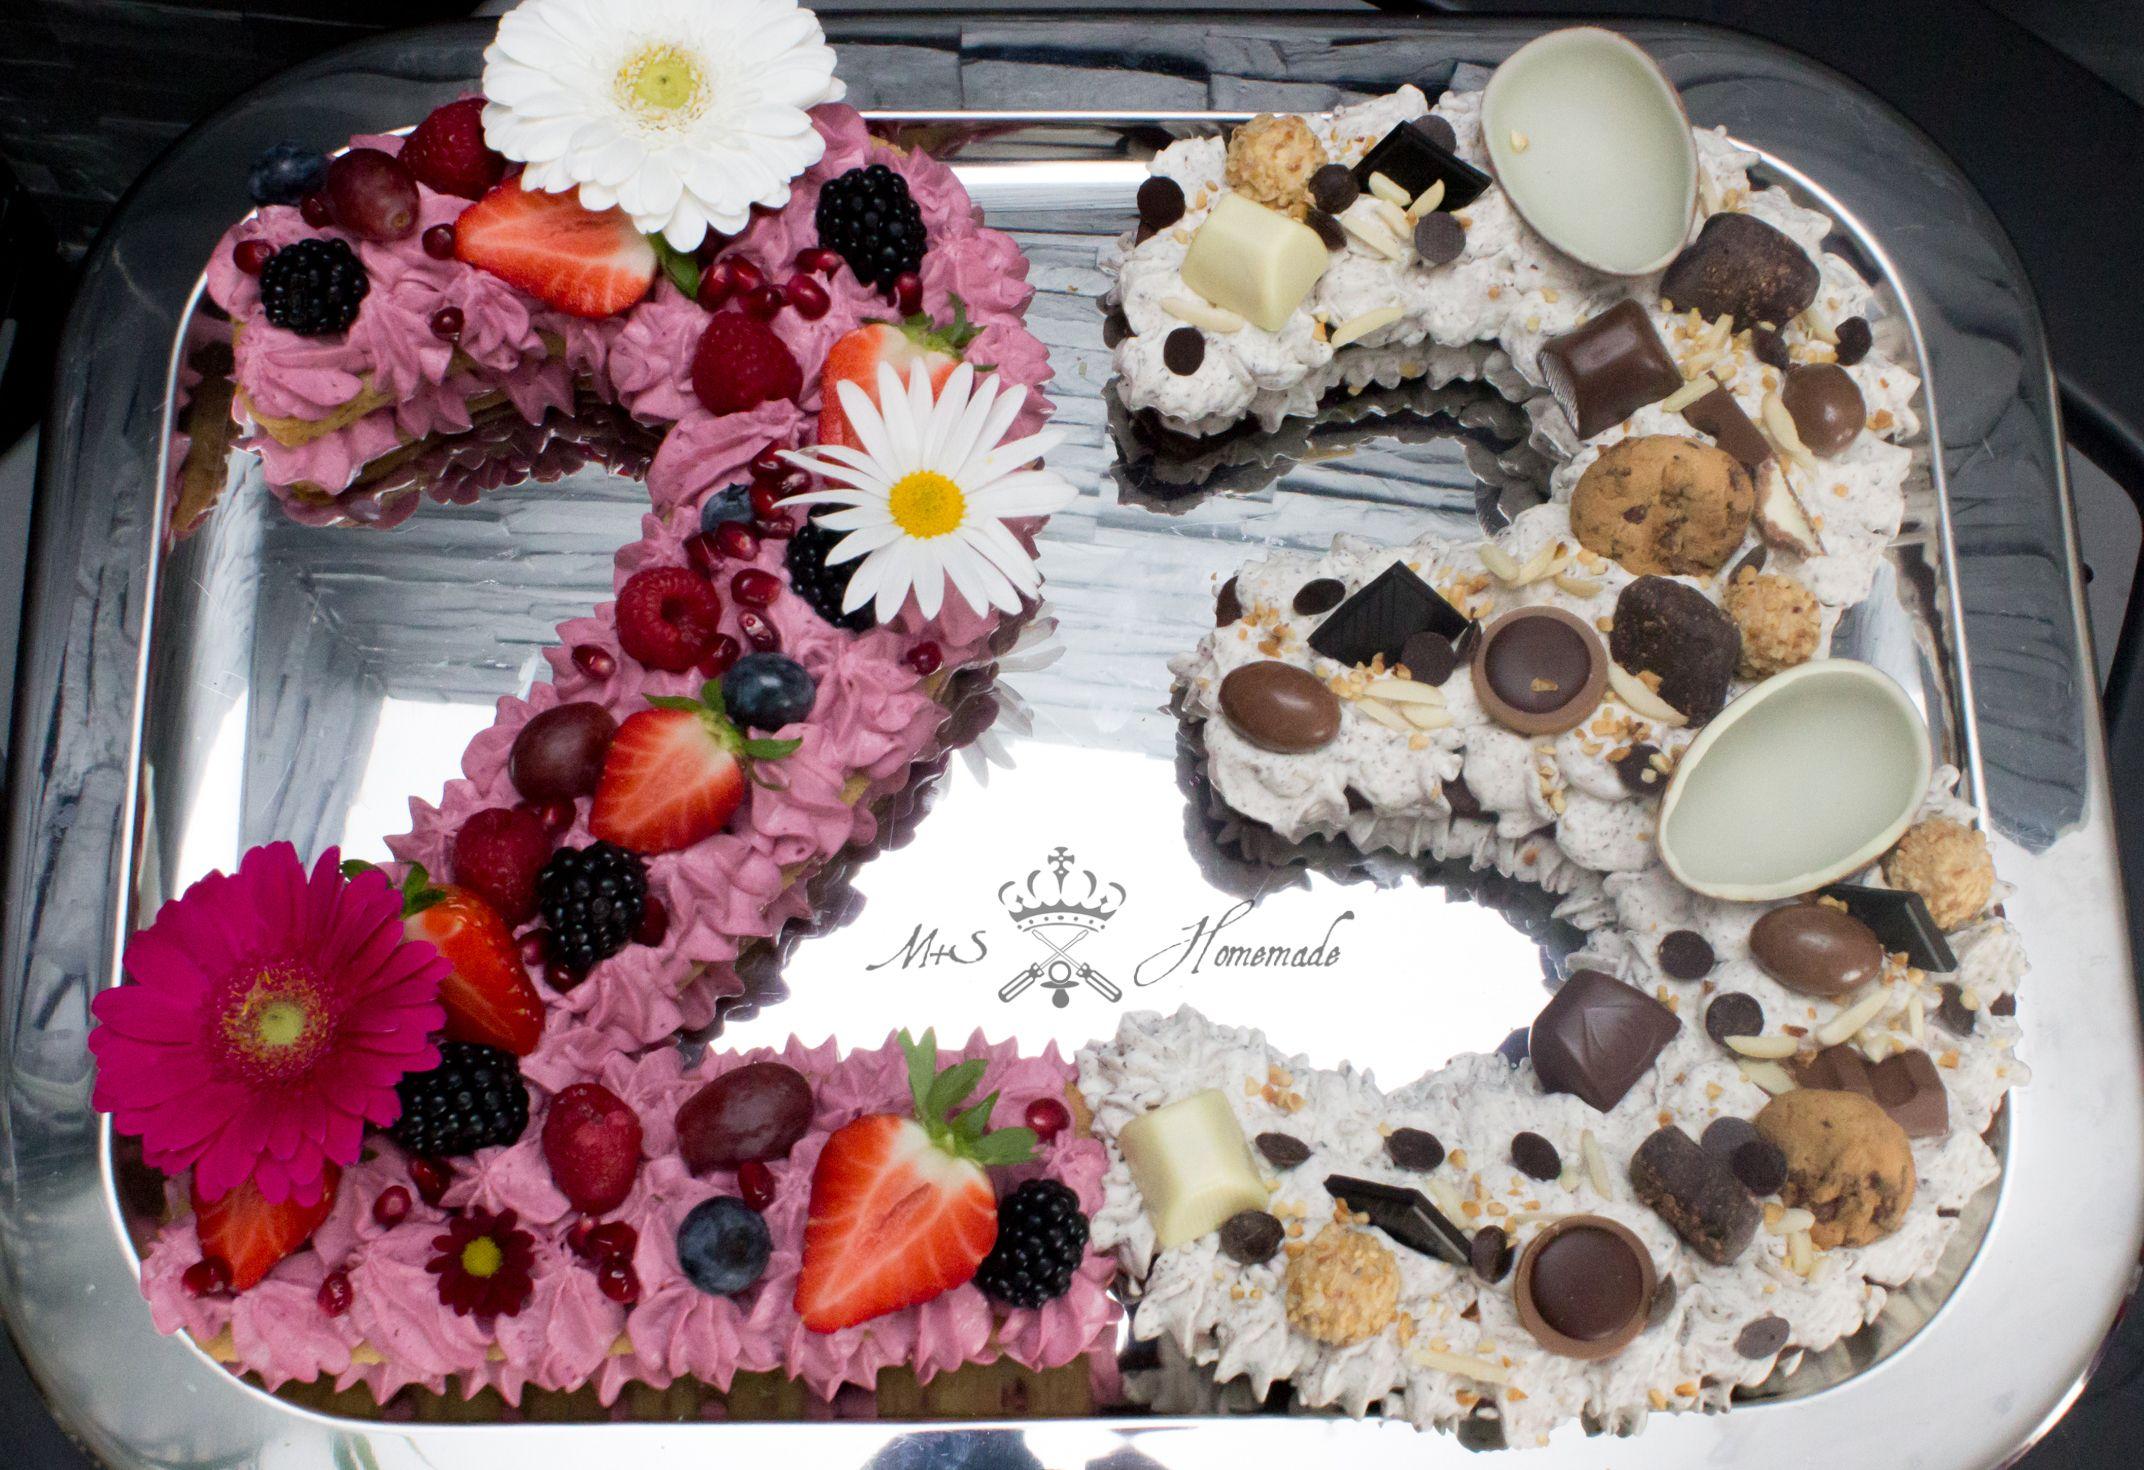 Number Cake Zahlentorte Trendtorte 2018 Lebensmittel Essen Motivtorten Torten